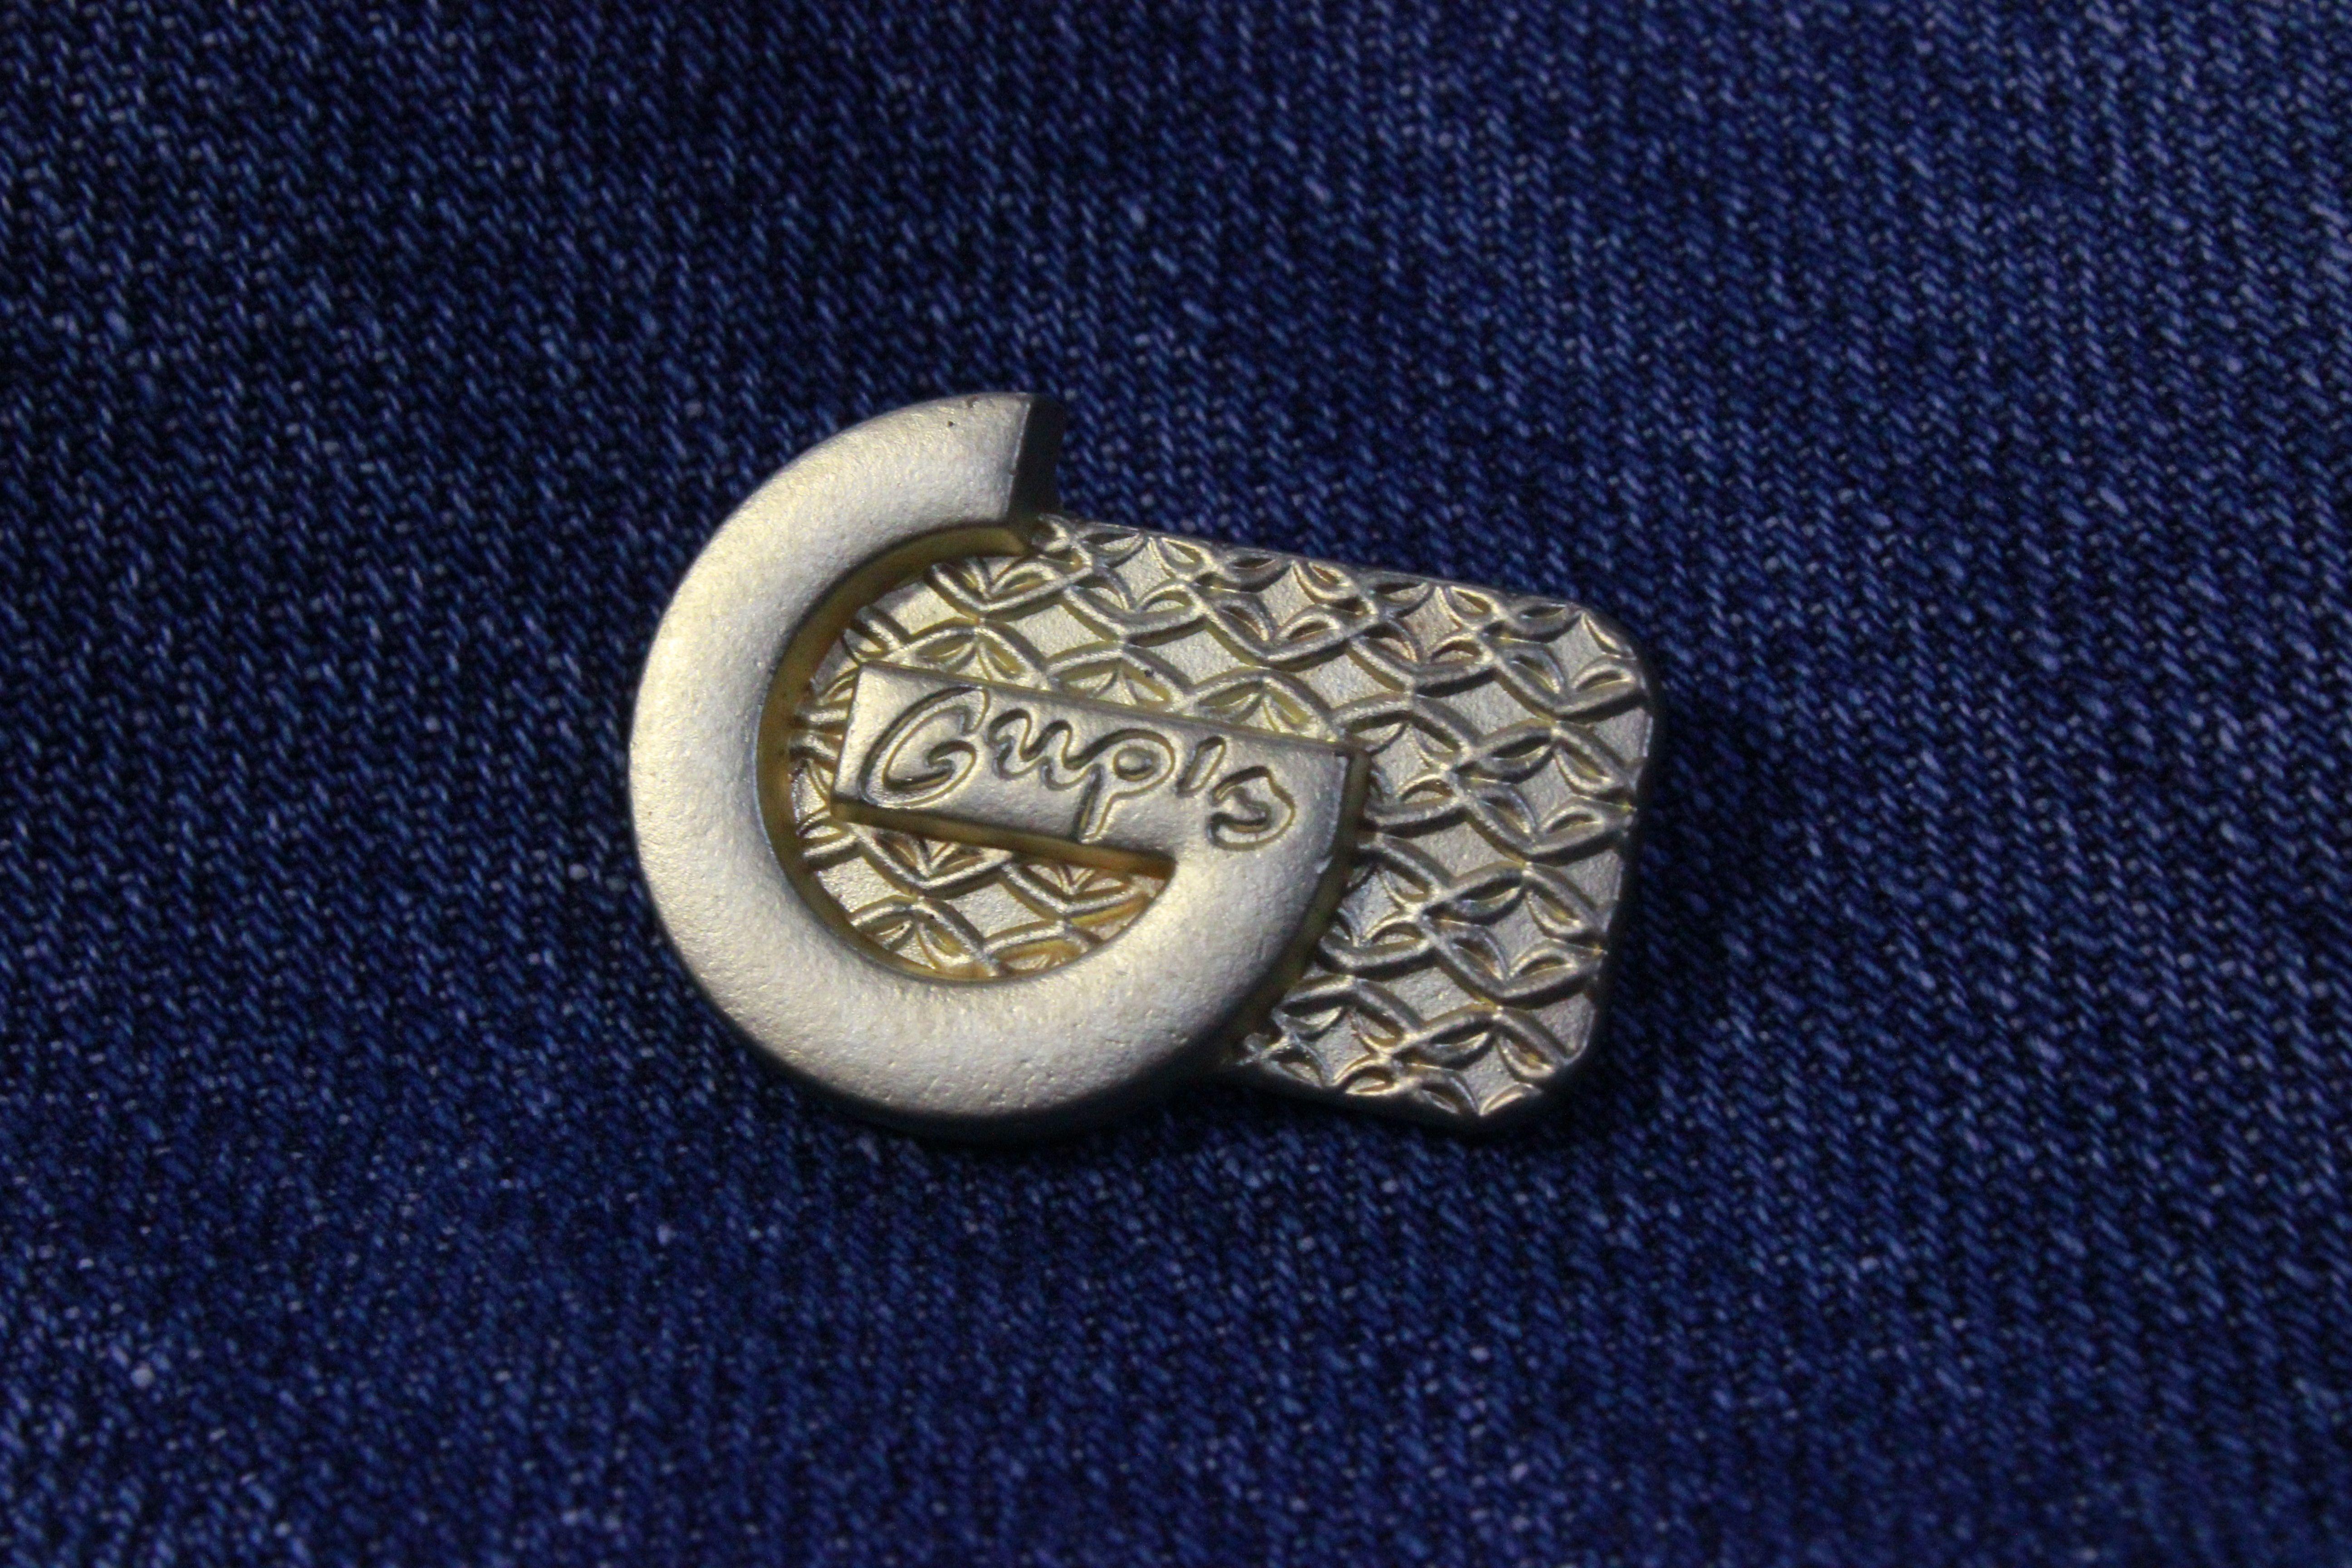 #estradavelasquez #estrada #velasquez #diseño #fashion #detalles #placa #decorativa #jeans www.estradavelasquez.com